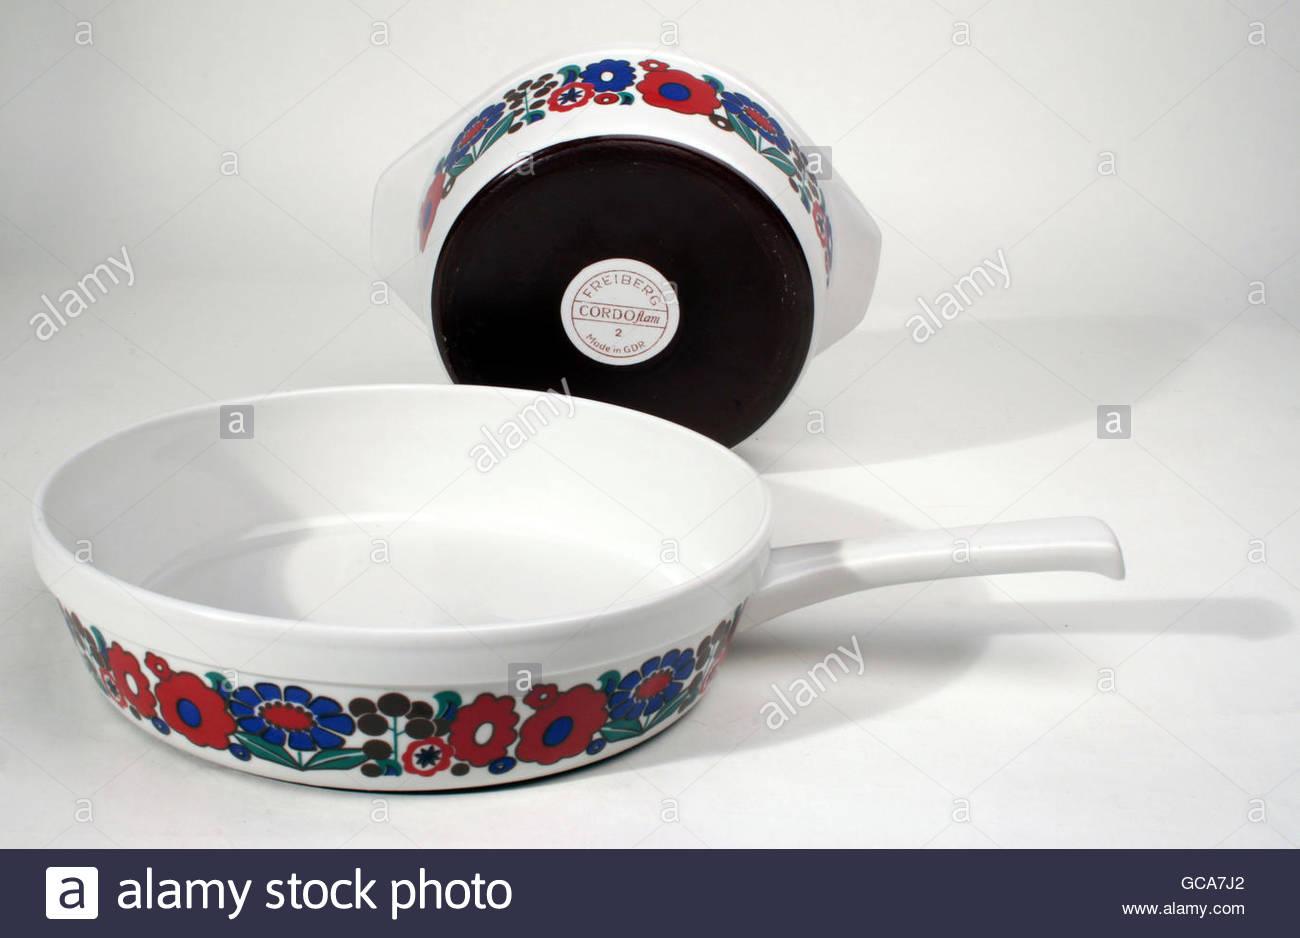 household, dishes, cookware, set 'Cordoflam', porcelain, VEB Porzellanwerk Freiberg, 1966/1967, Design von - Stock Image